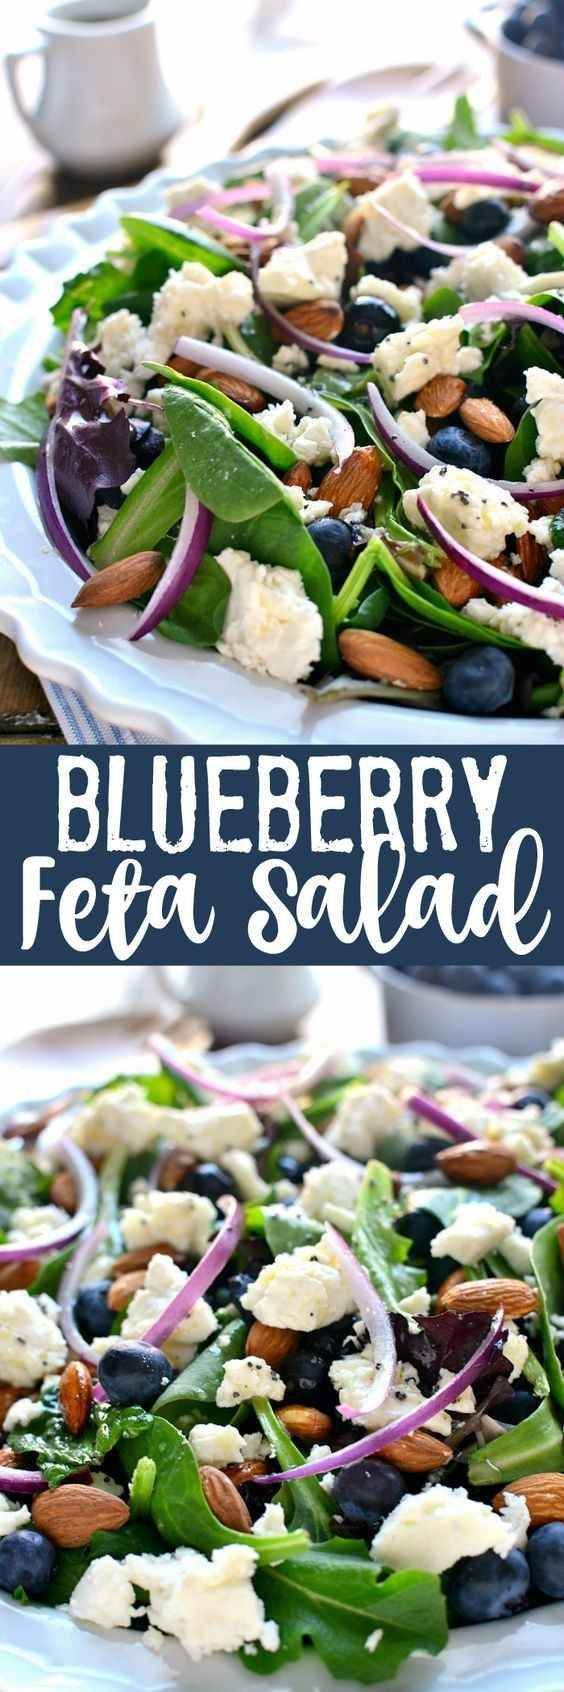 Blueberry feta salad with lemon poppy-seed dressing.